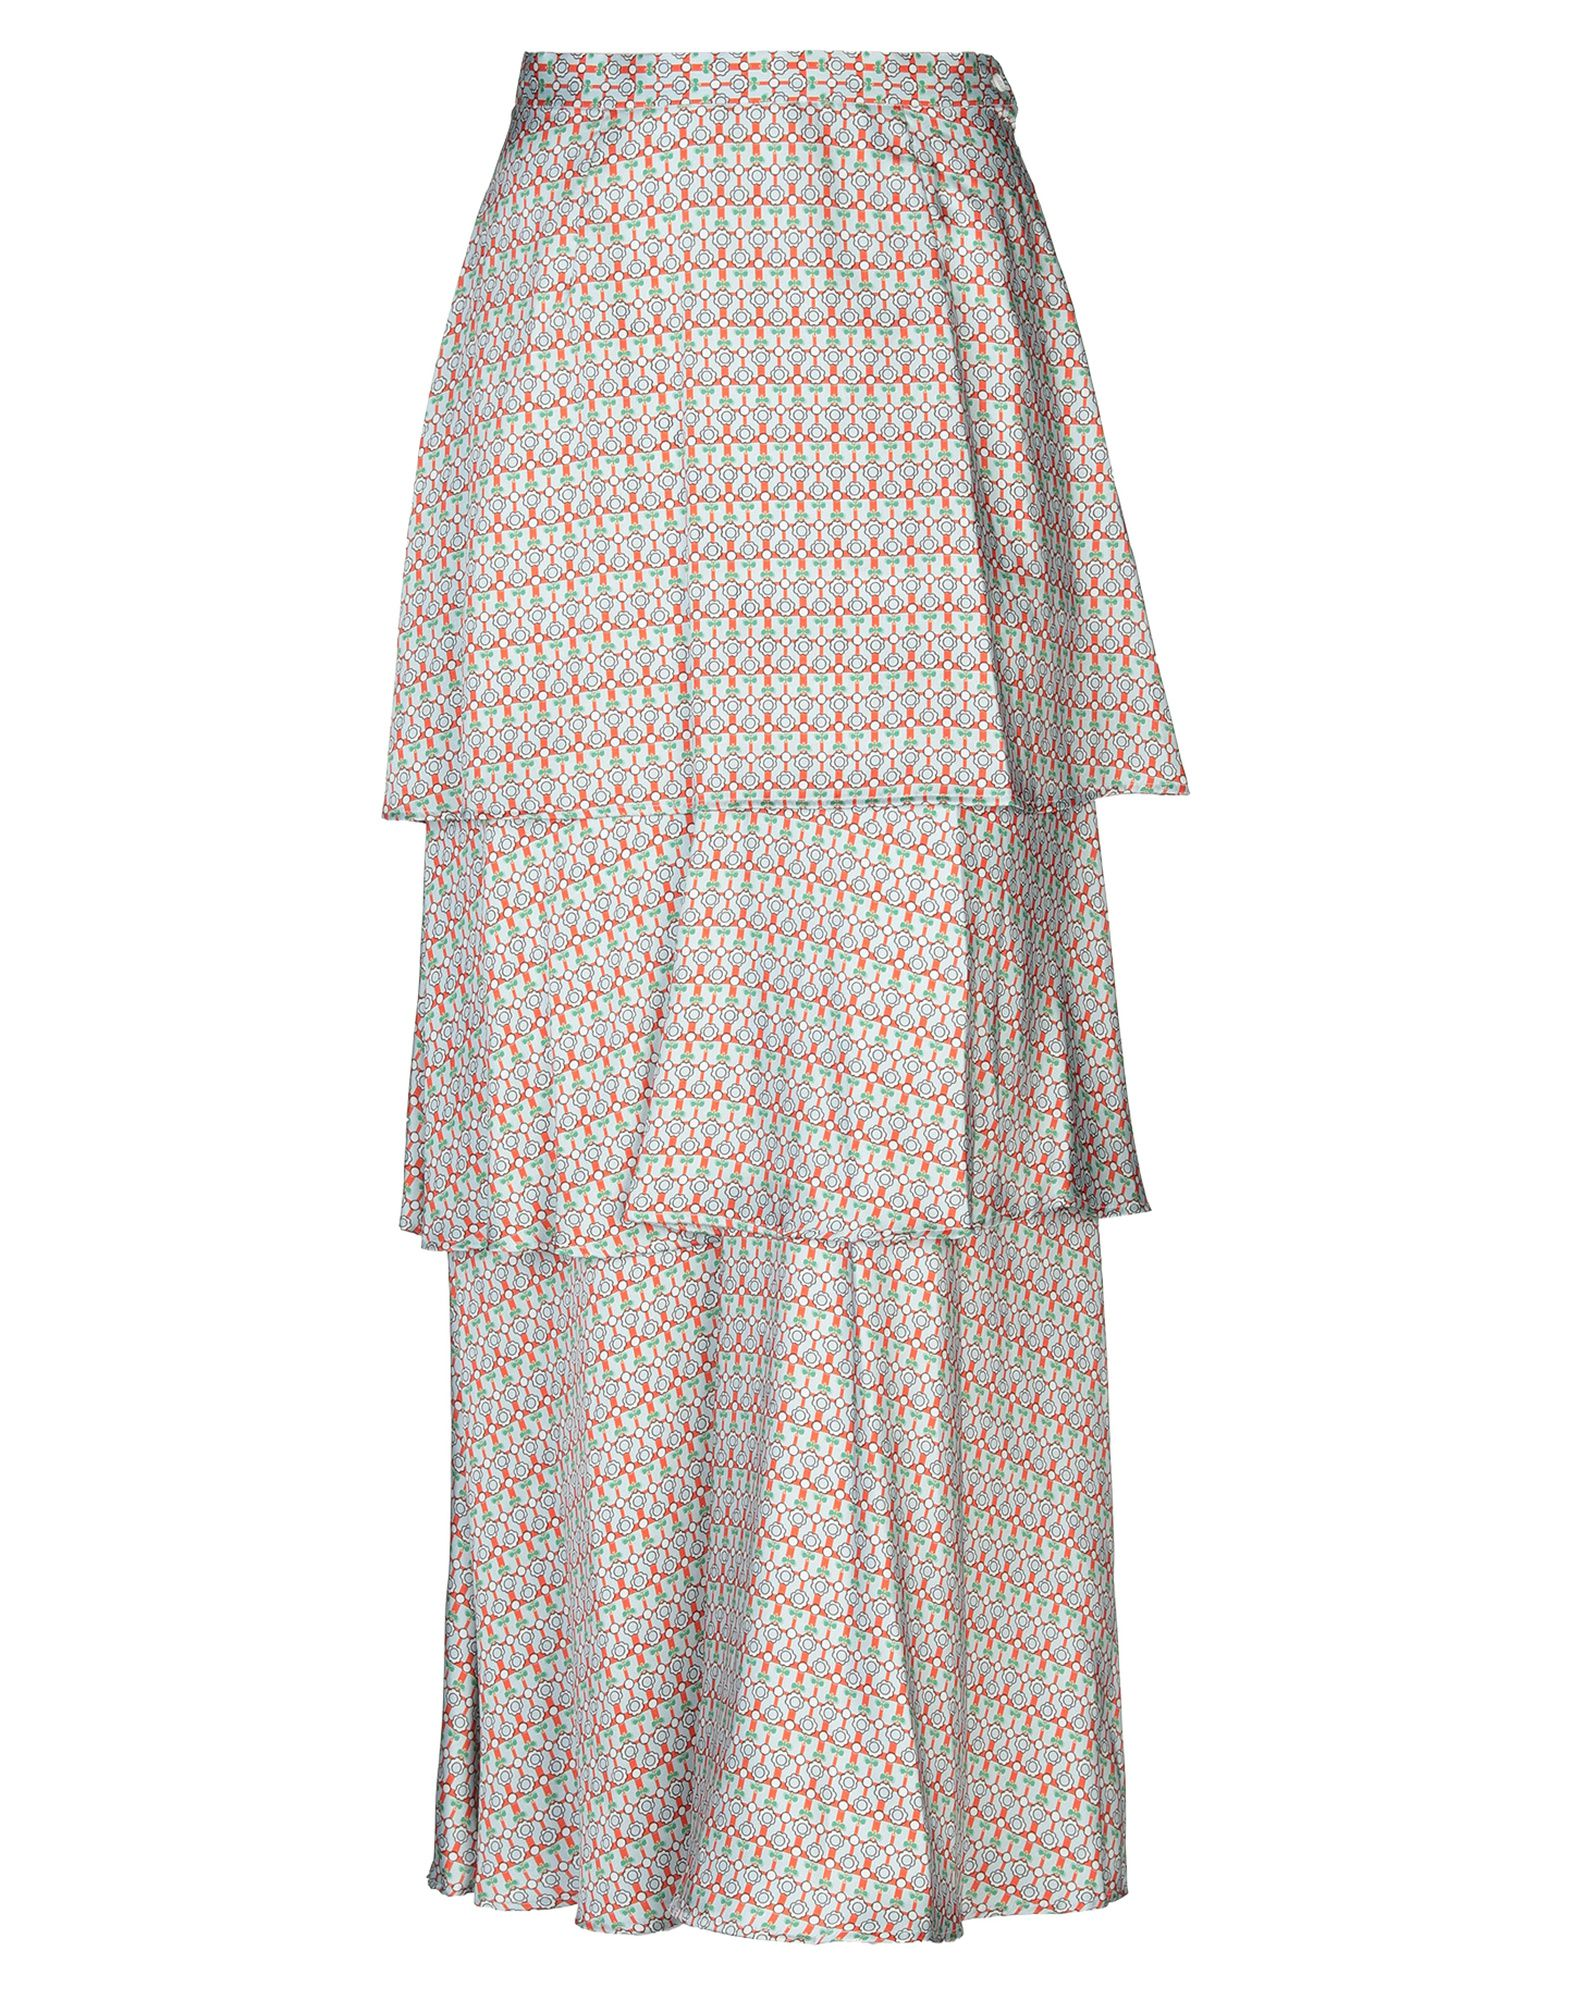 DONDUP Длинная юбка dondup длинная юбка